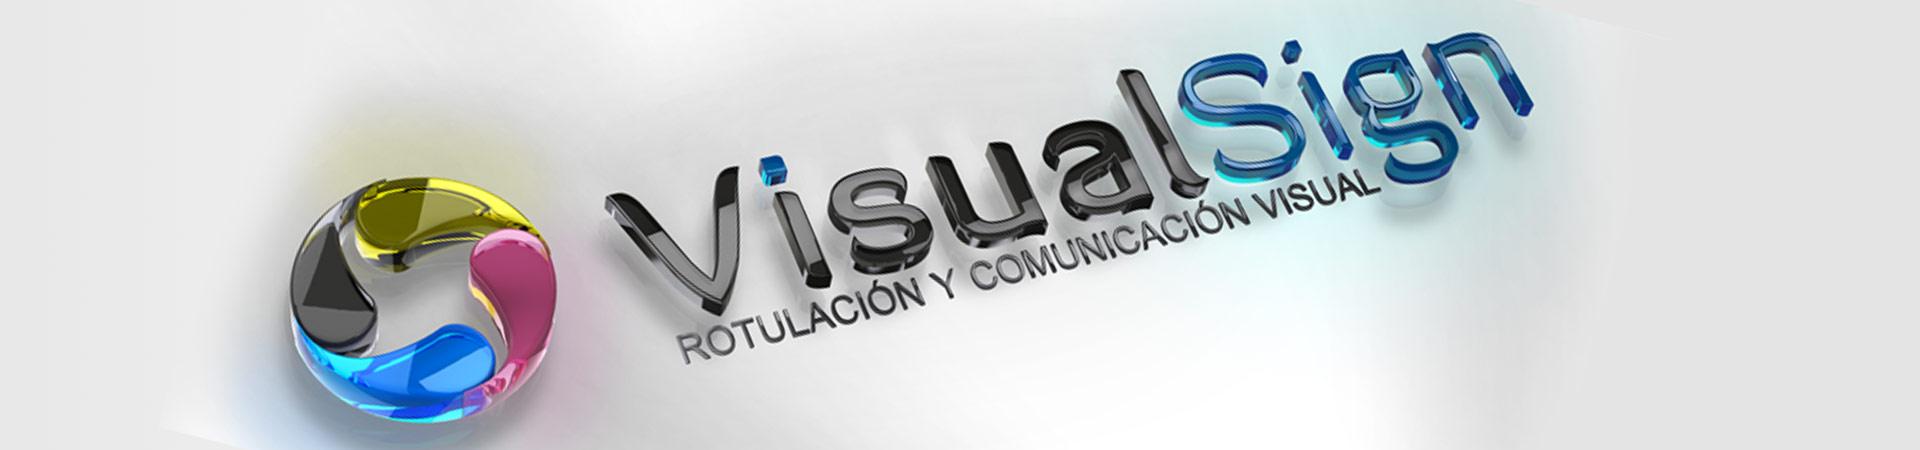 imagen_logo3d_carrusel